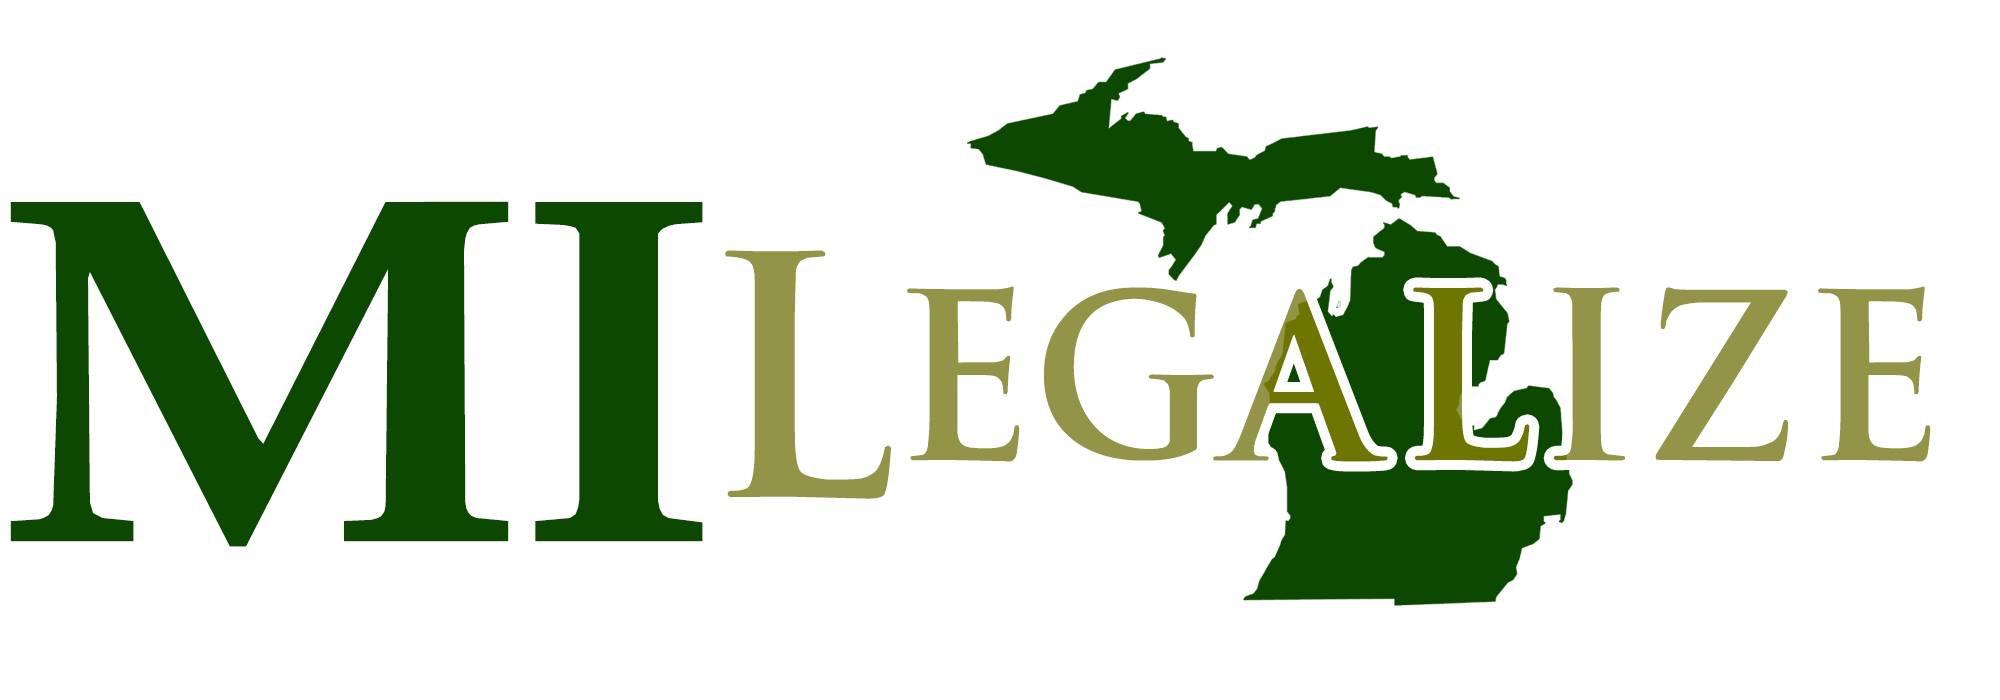 MILegalize_Logo.jpg